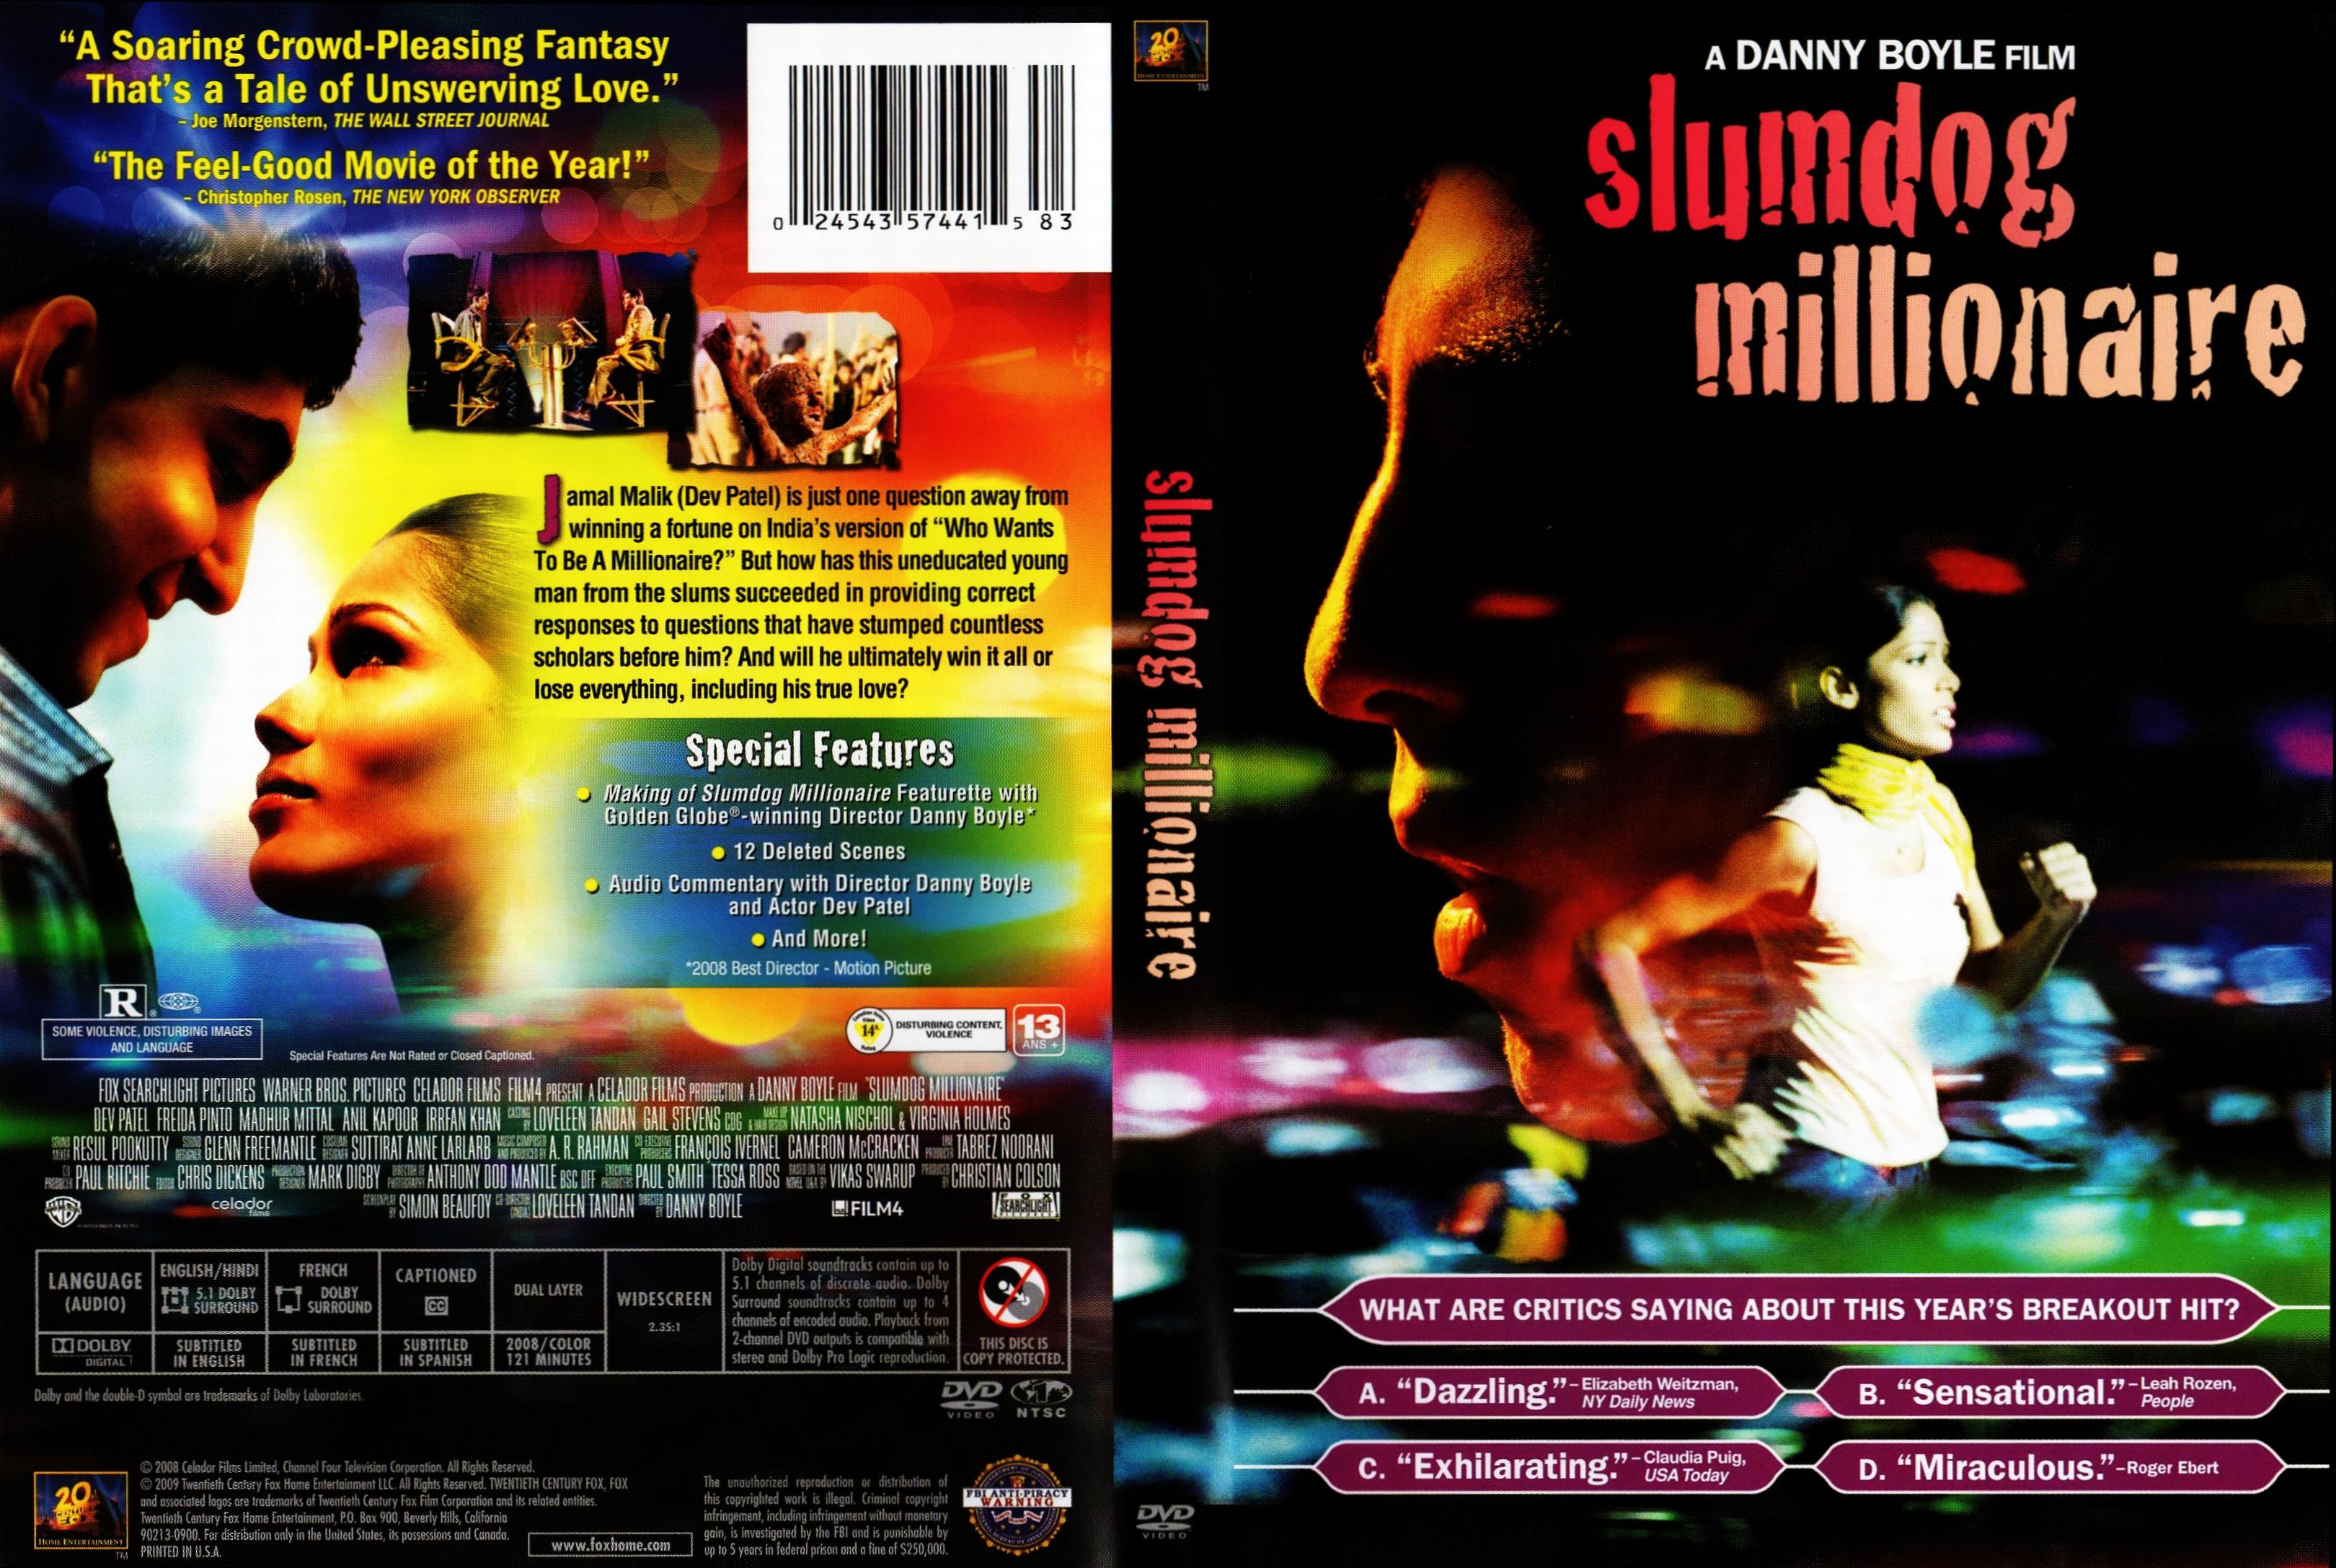 Covers Box Sk Slumdog Millionaire 2008 High Quality Dvd Blueray Movie